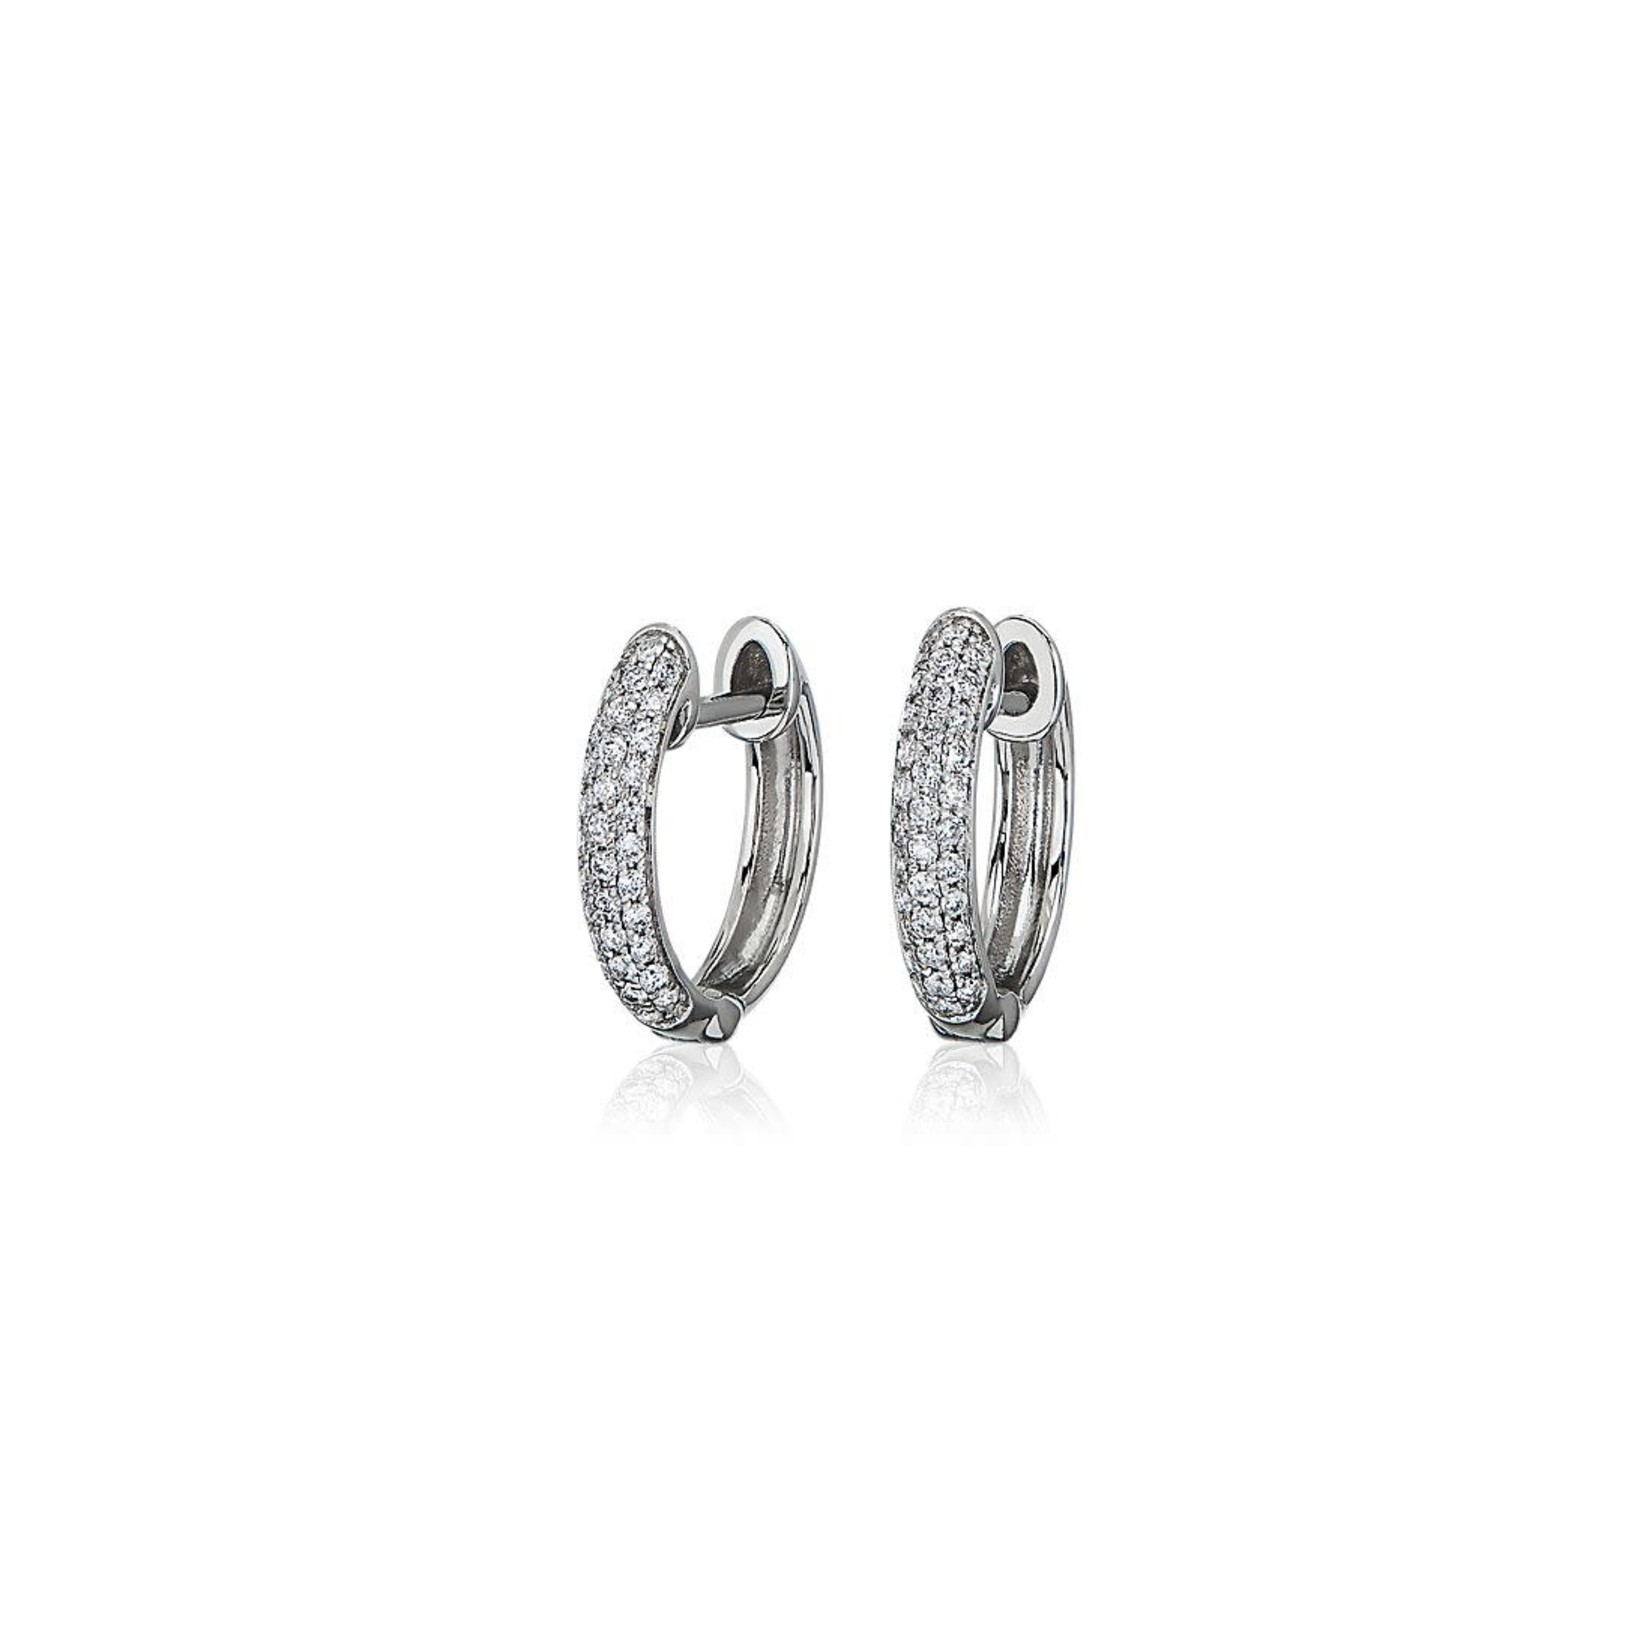 14KW Gold Diamond 1.22ctw Pave Hoop Earrings